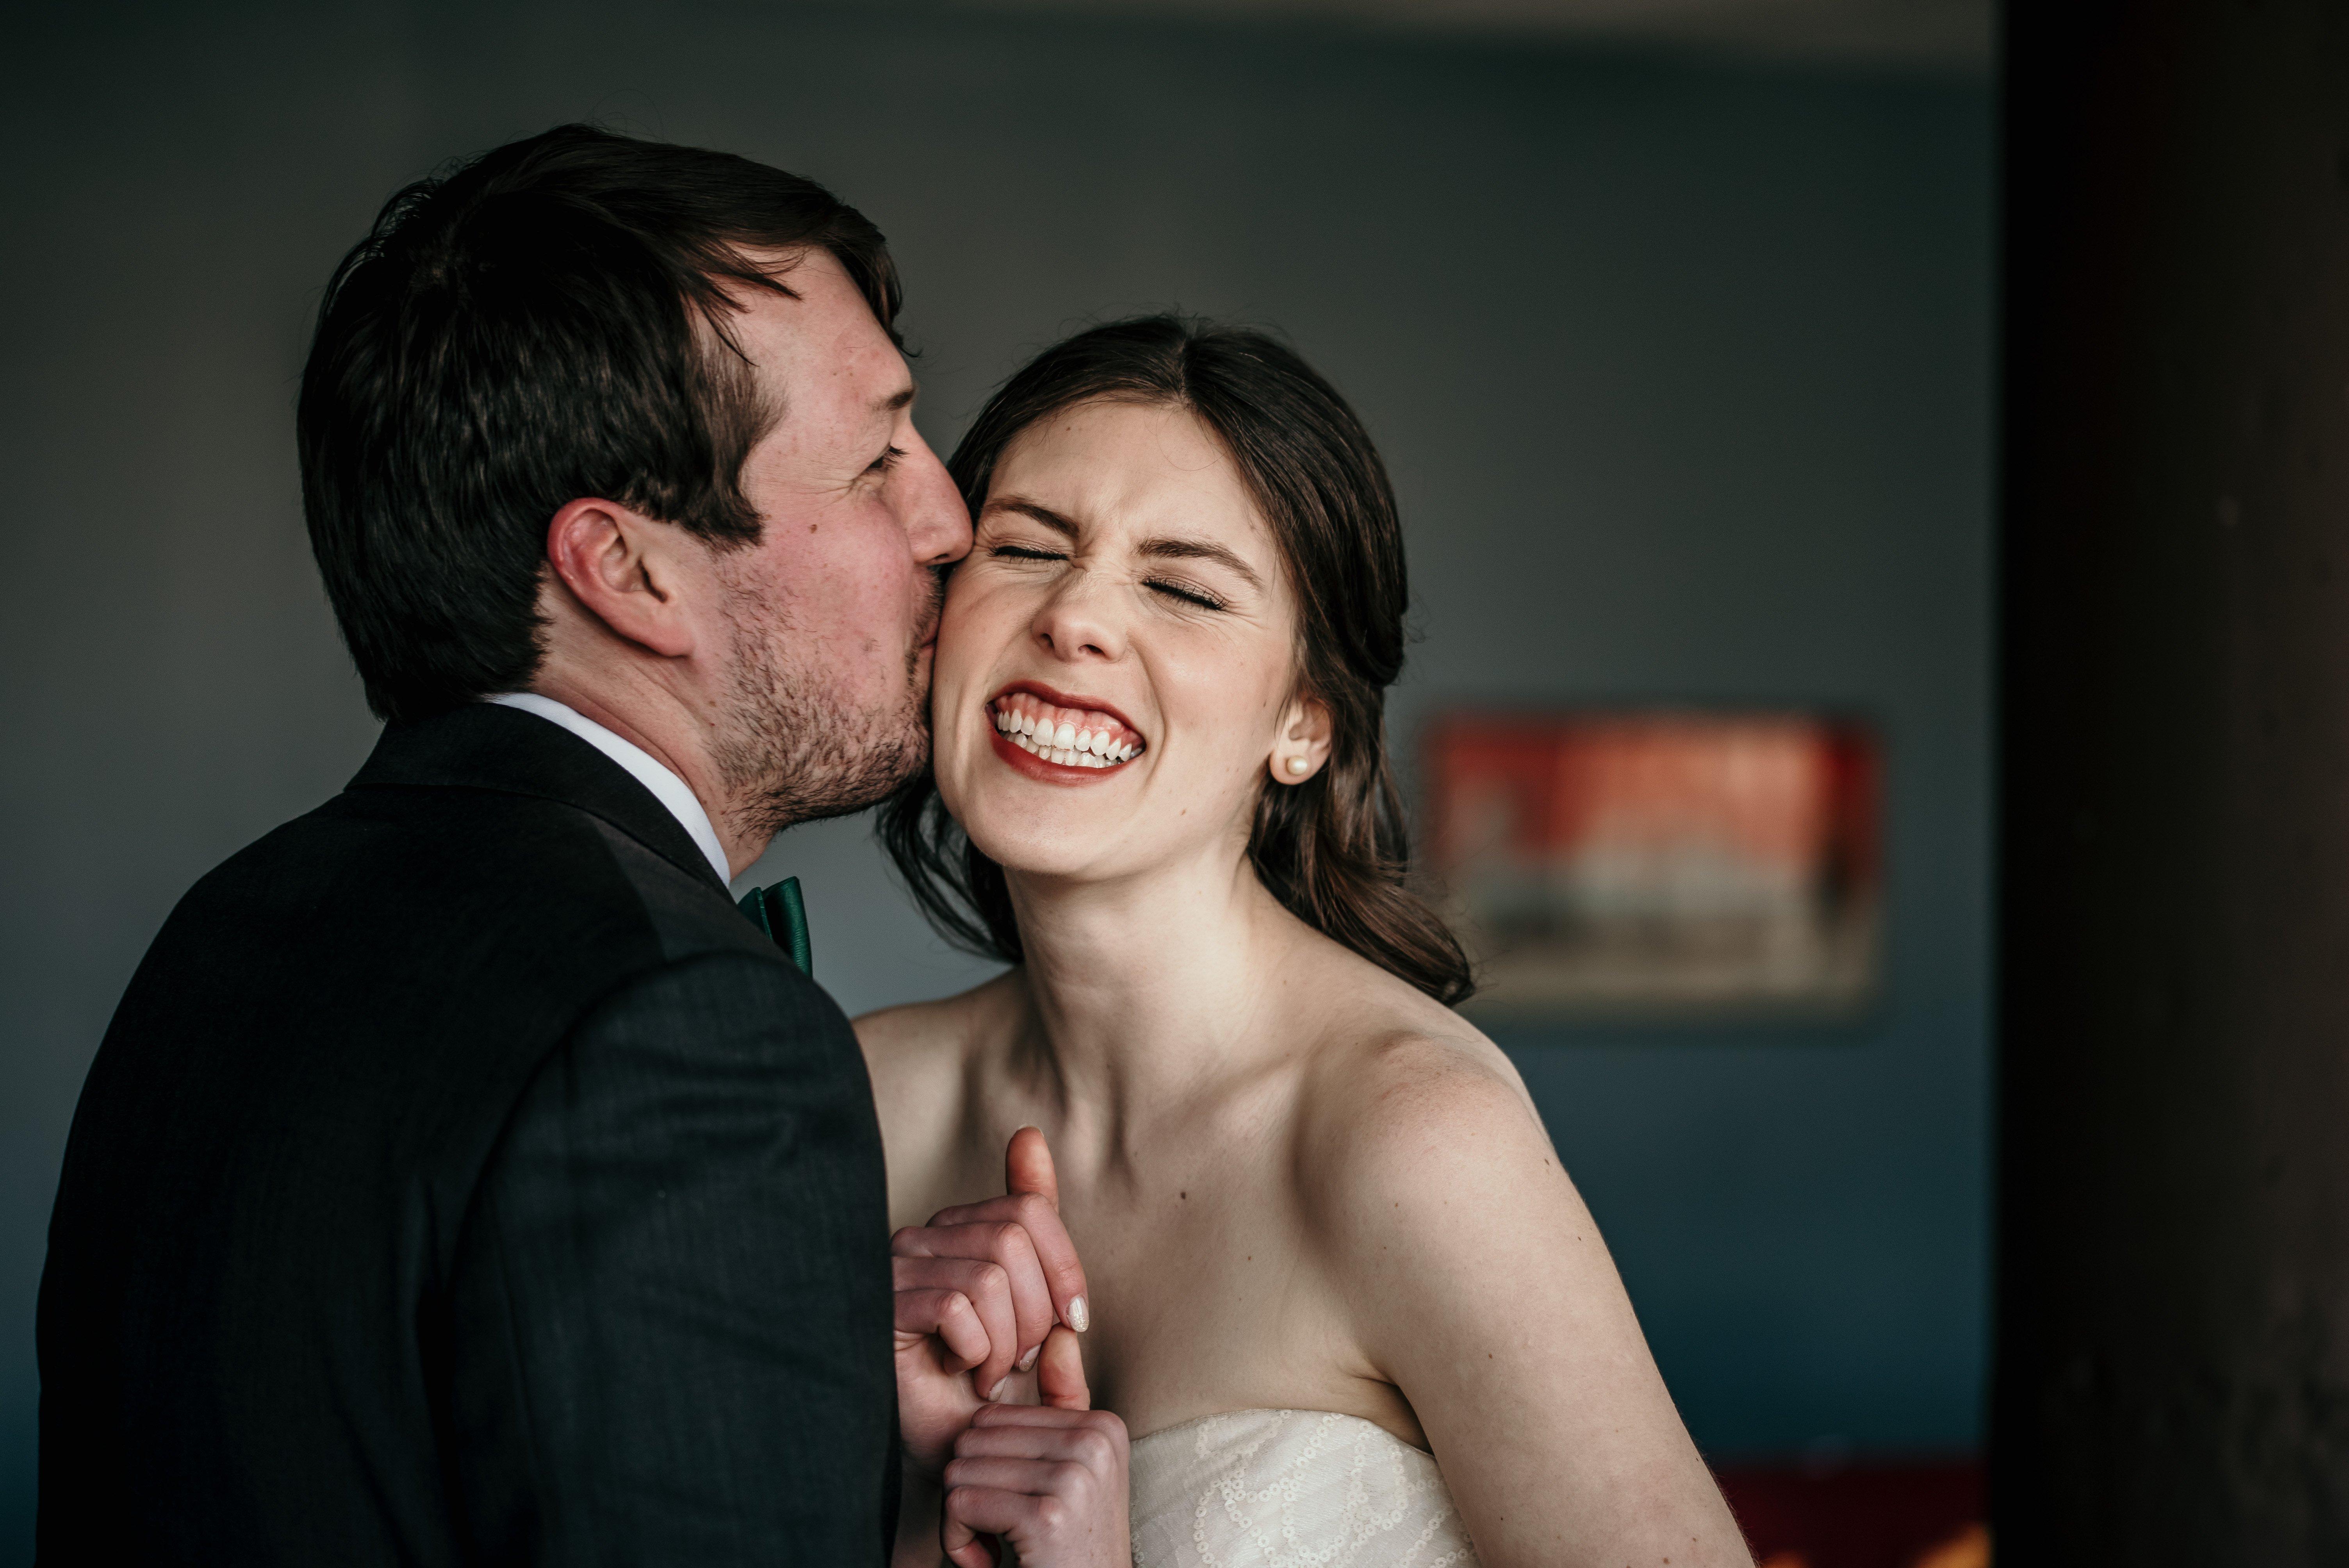 Captured wedding moments